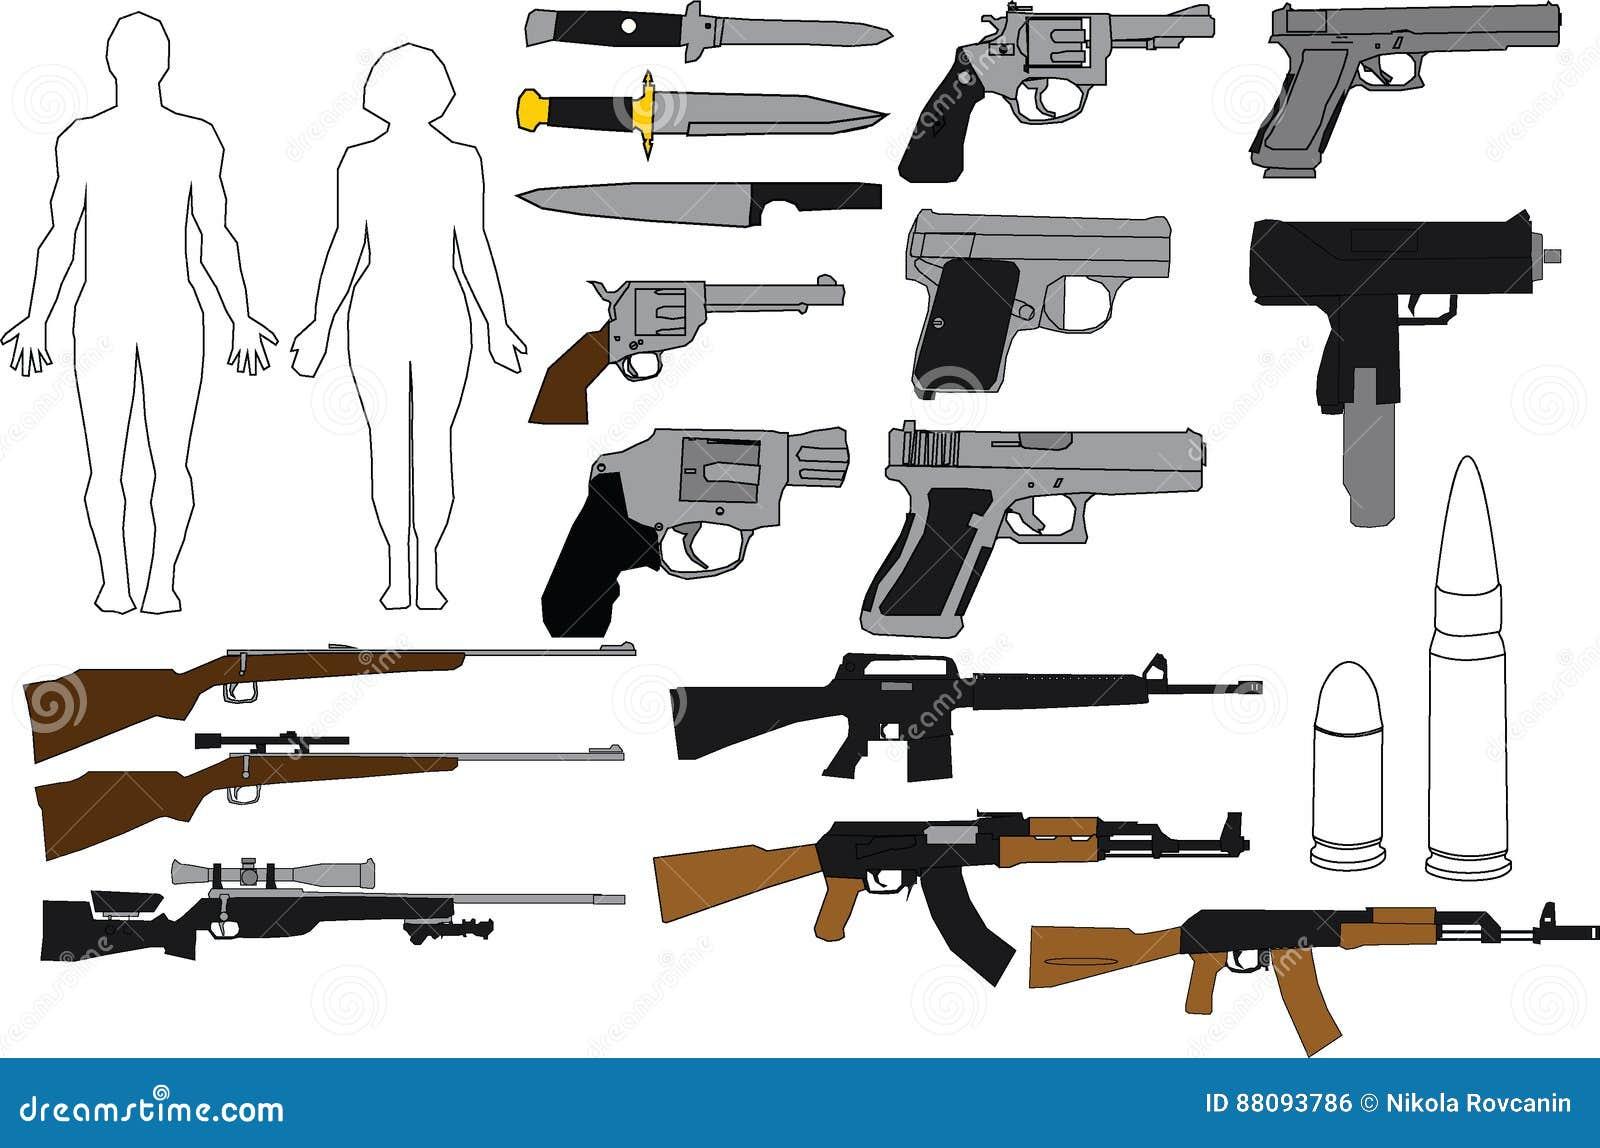 Illustration guns and rifles